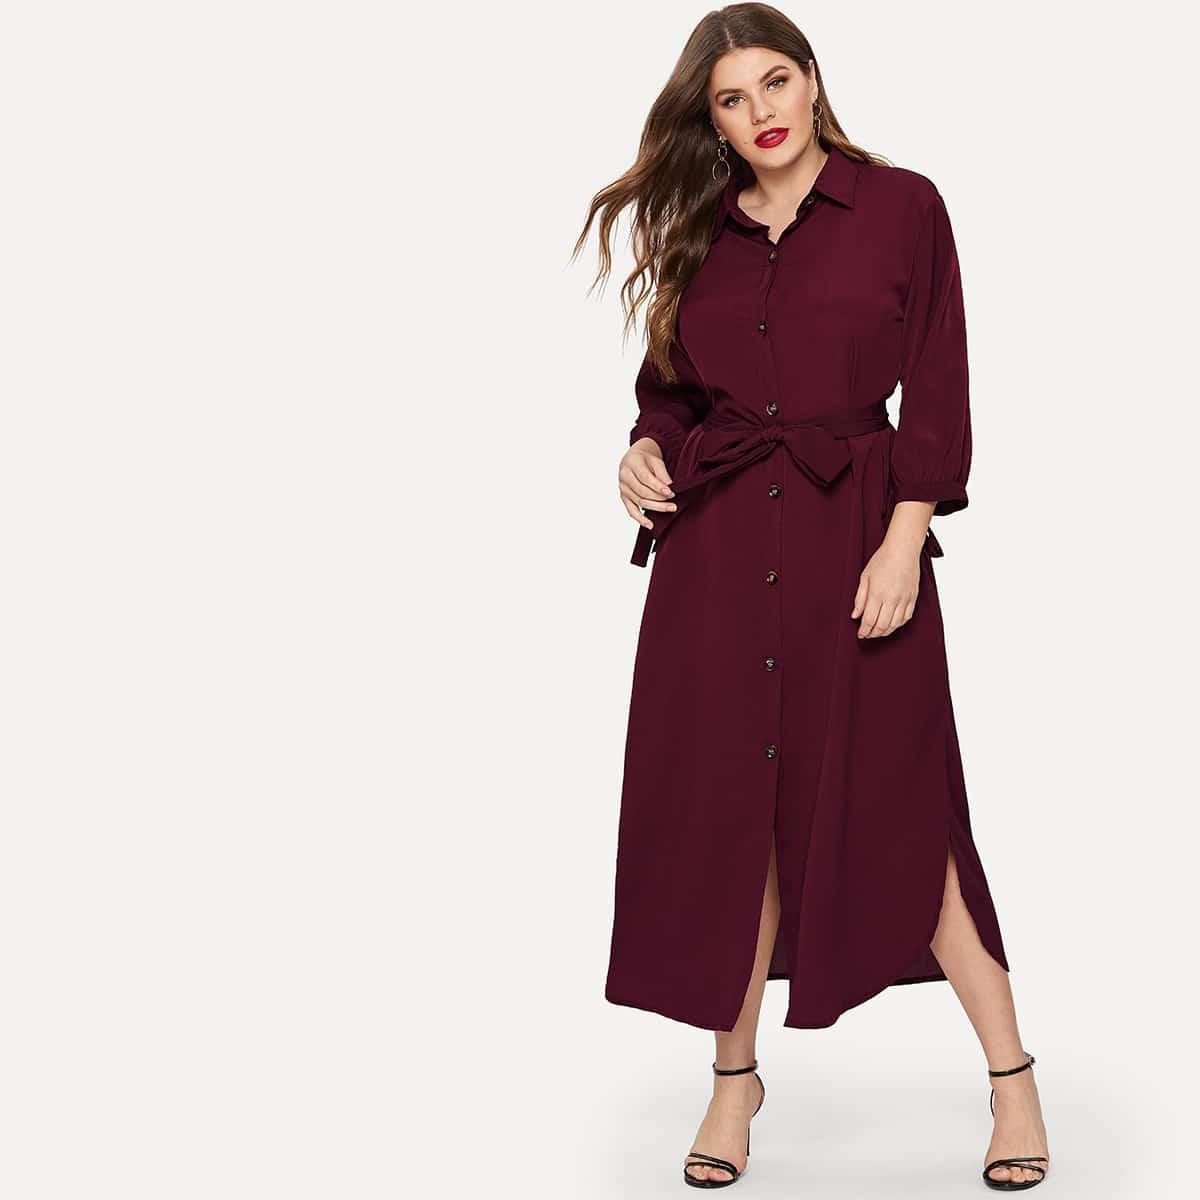 Bordeaux Casual Vlak Grote maten jurken Riem